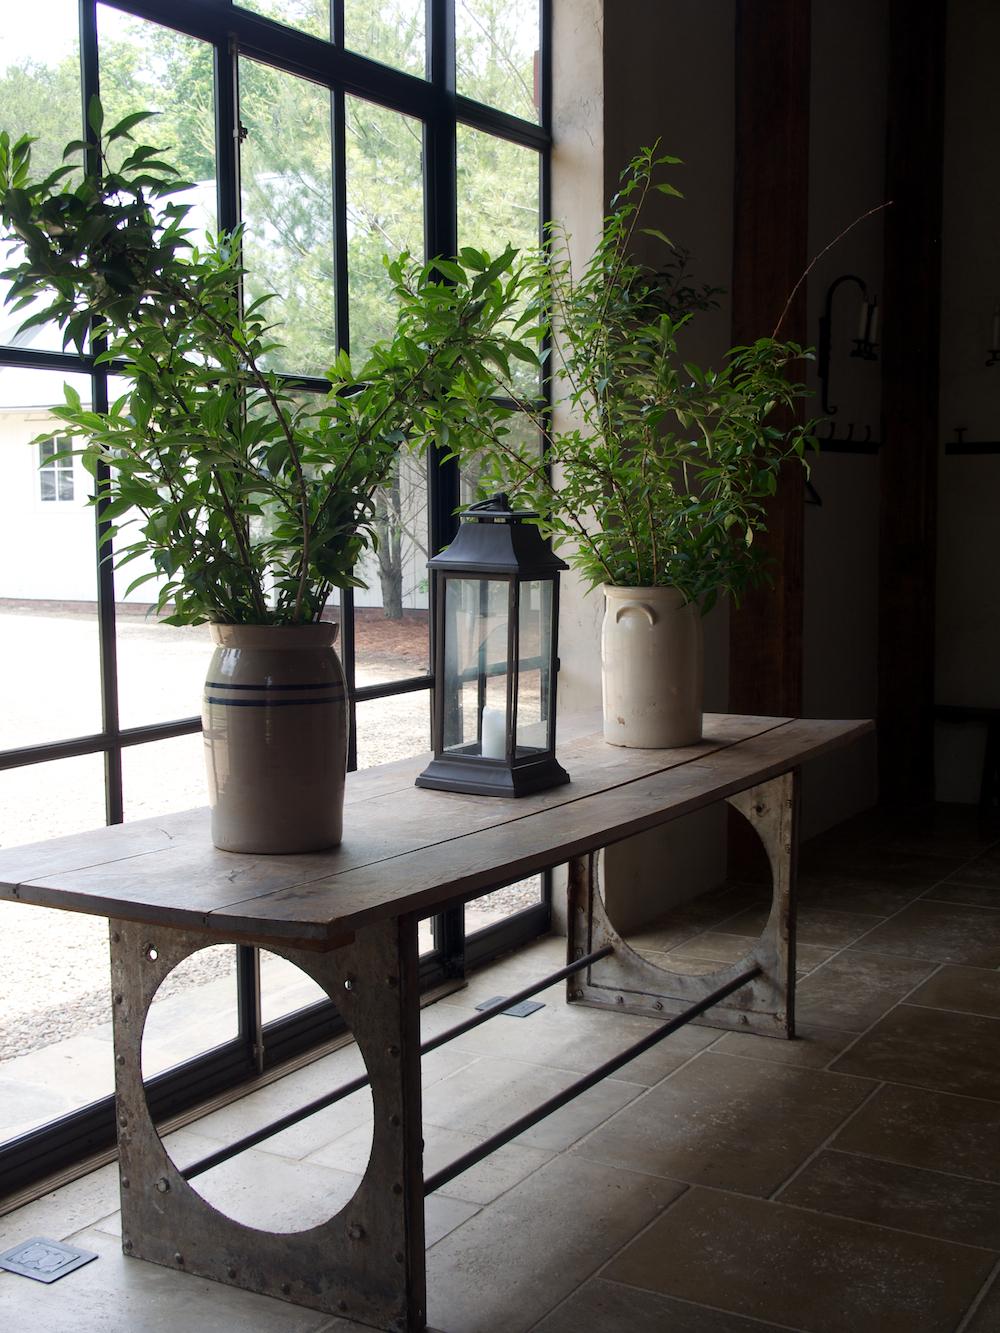 Chucks rustic furniture obsidiansmaze for Rustic elegance furniture